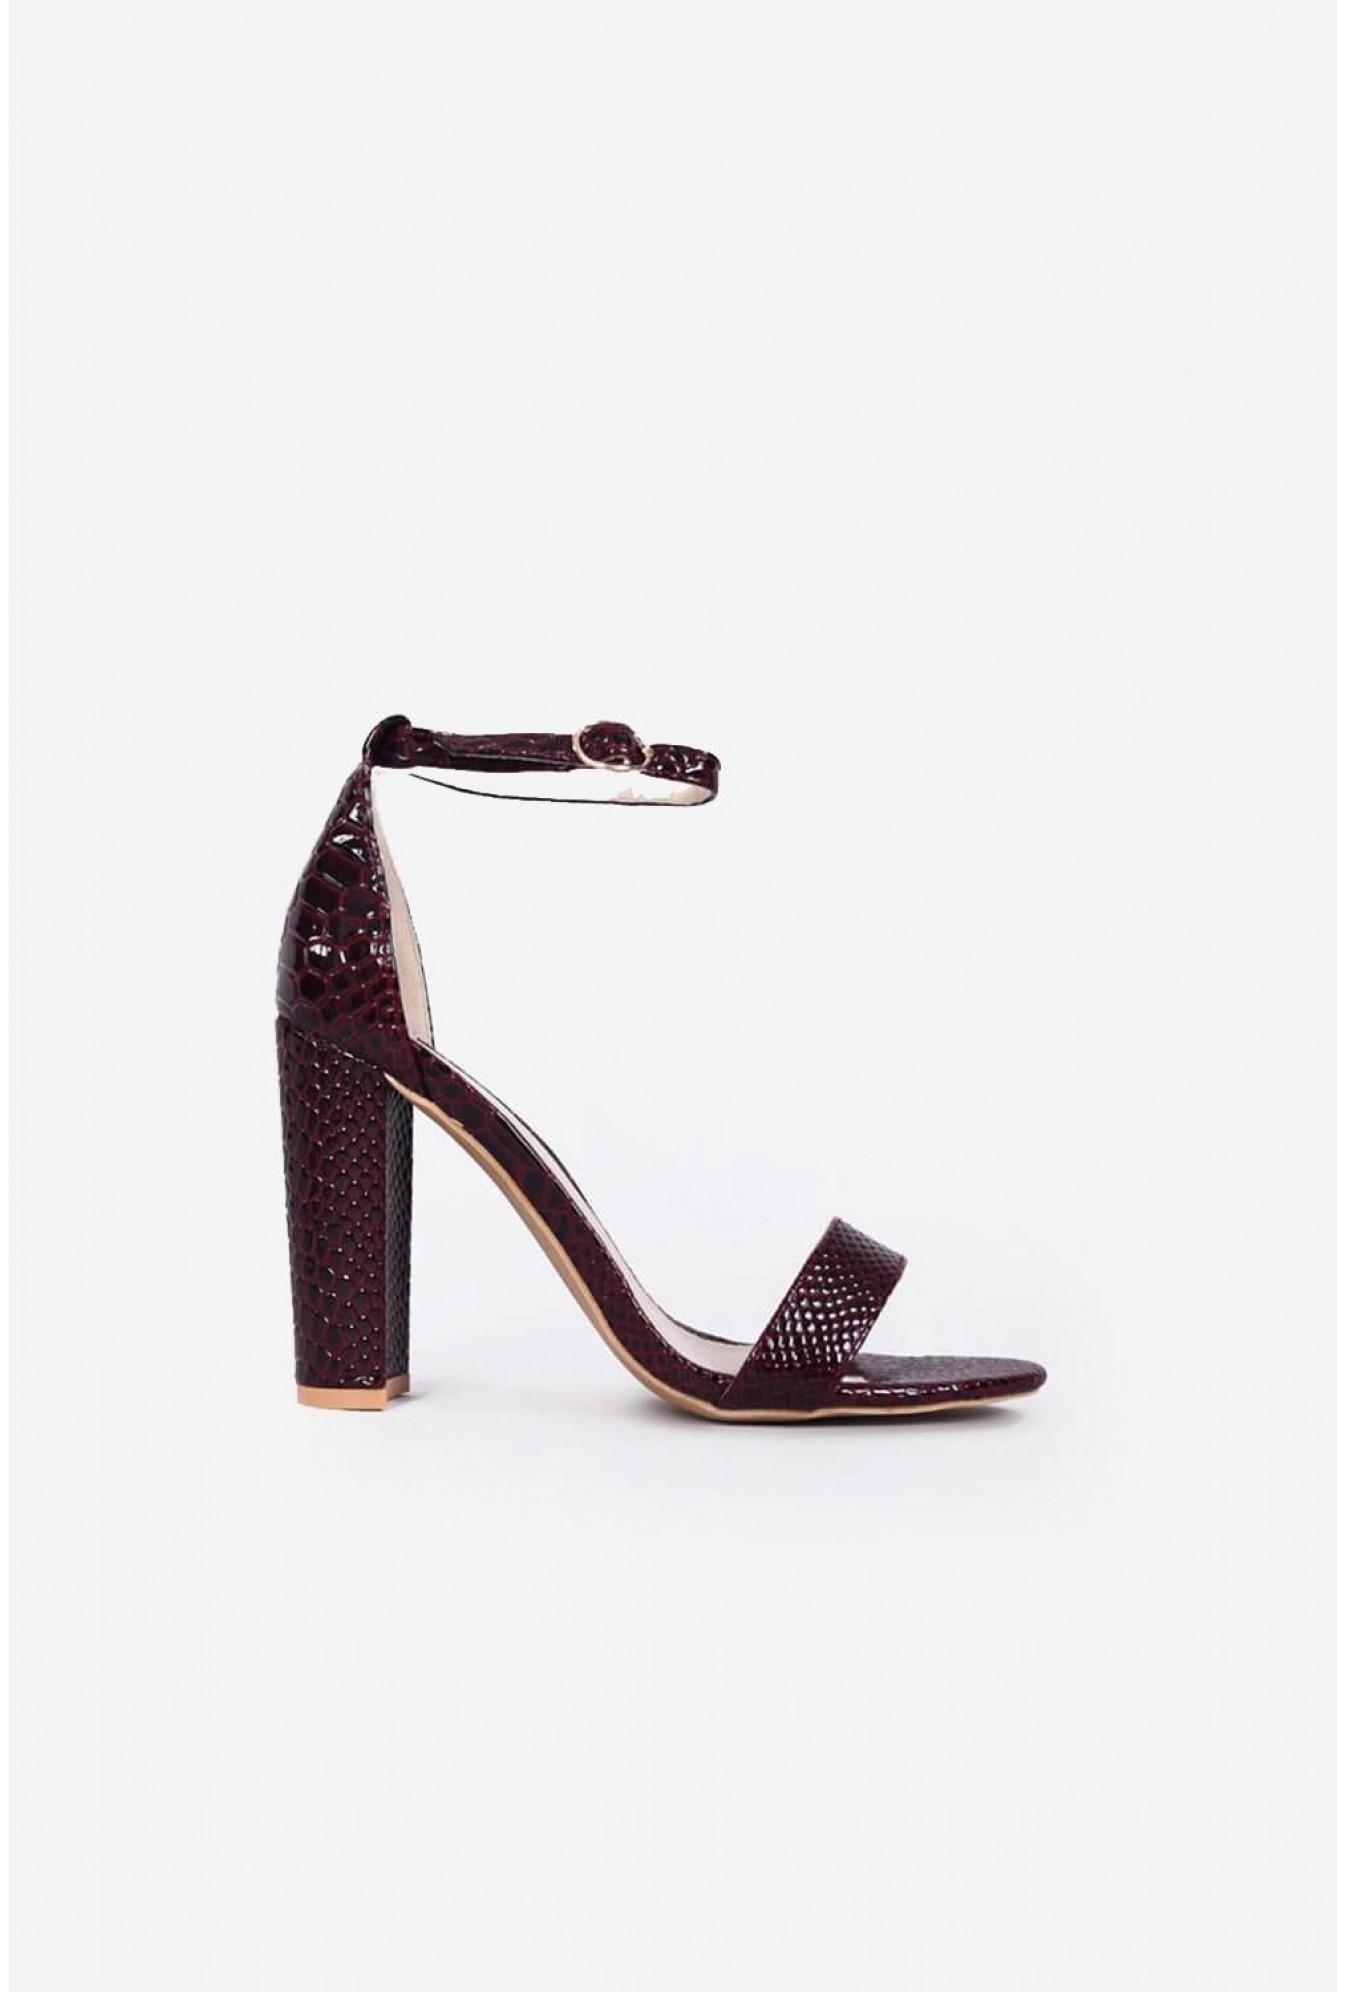 3edb7f1a083 Sitnaya Block Heels in Burgundy Snake